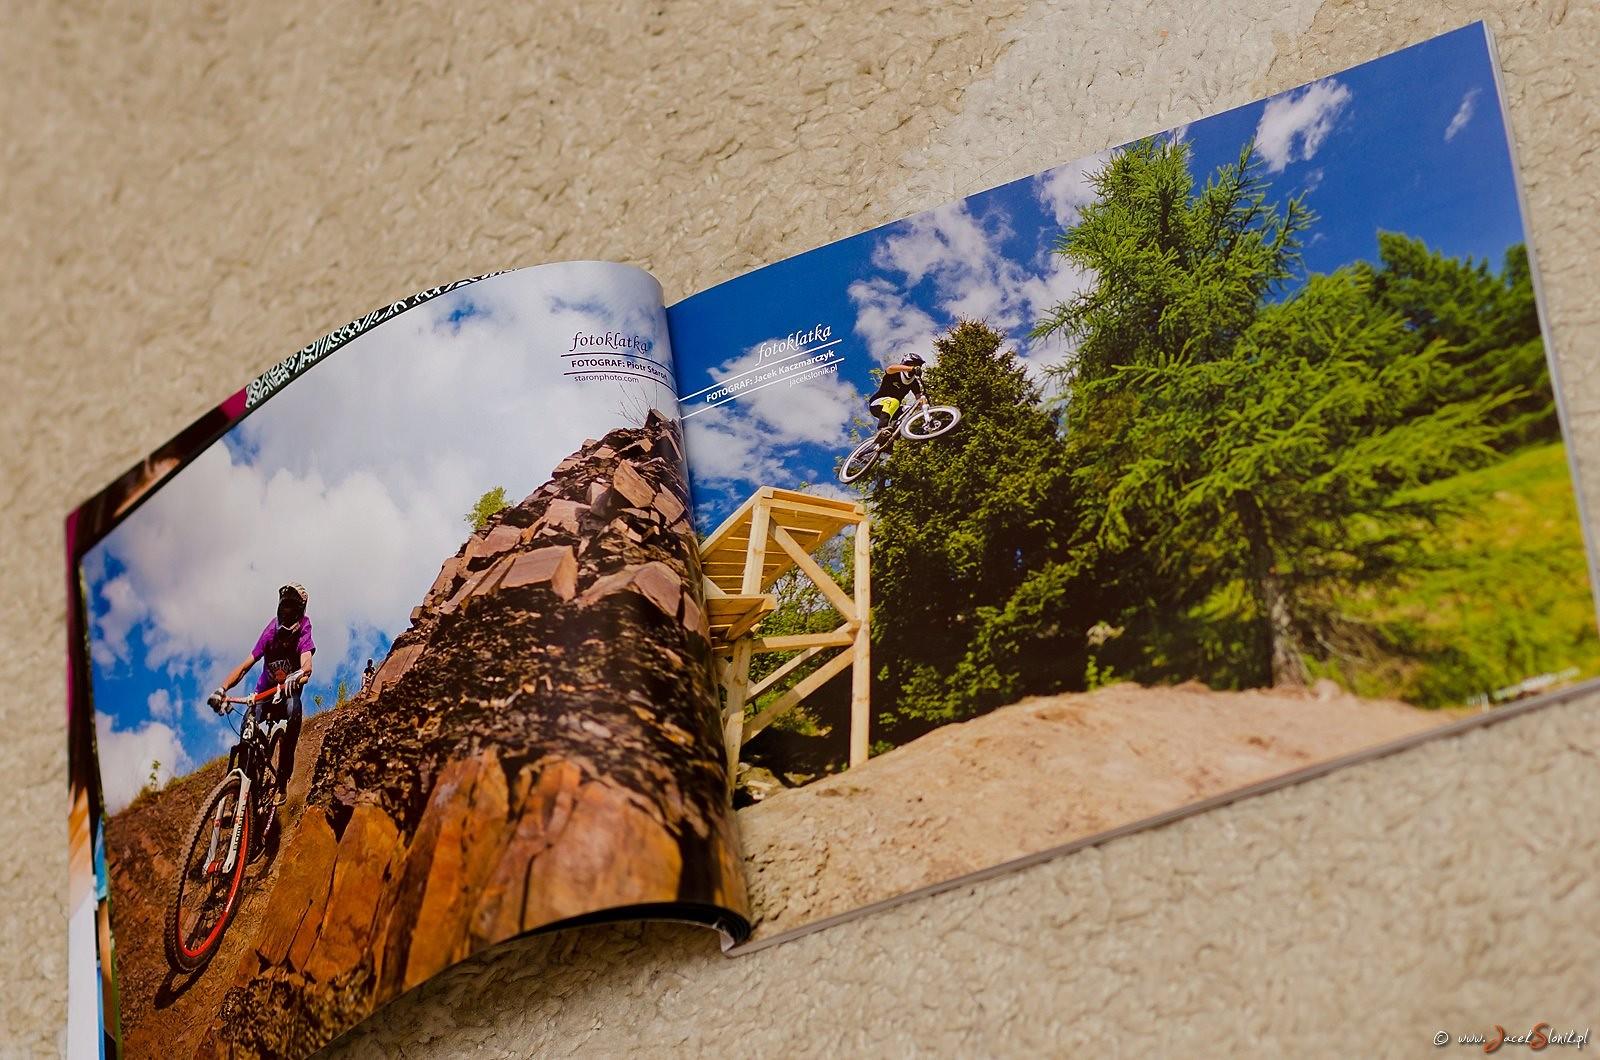 some magazine shot - Kawula - Mountain Biking Pictures - Vital MTB